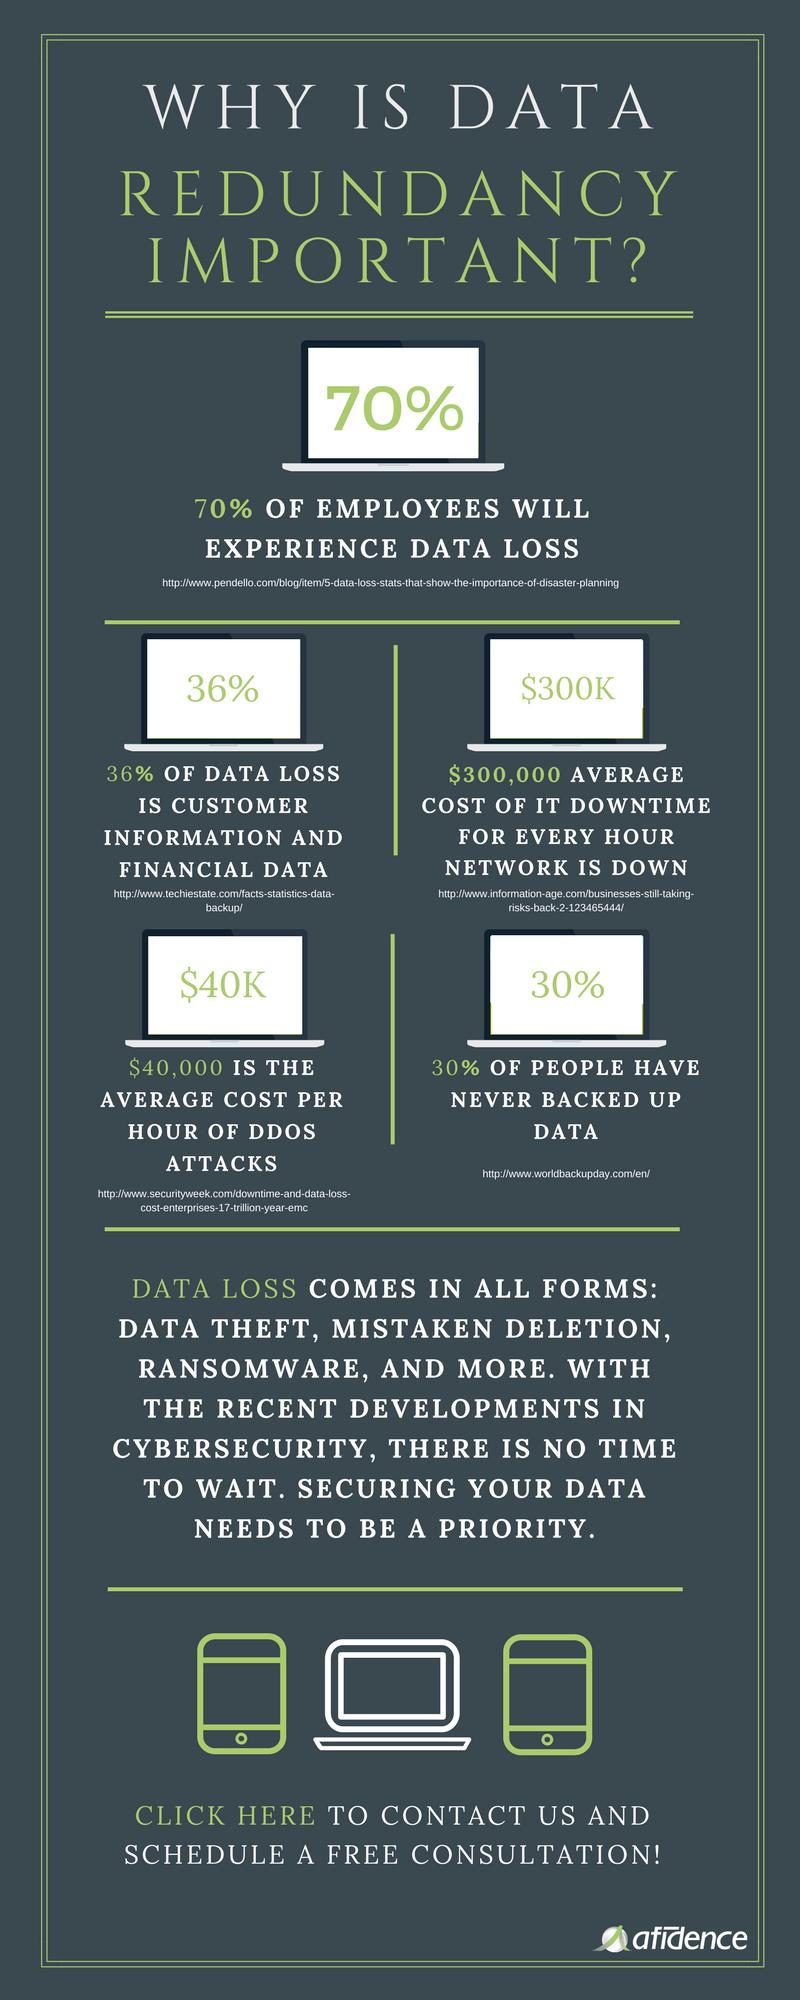 Importance of Data Redundancy